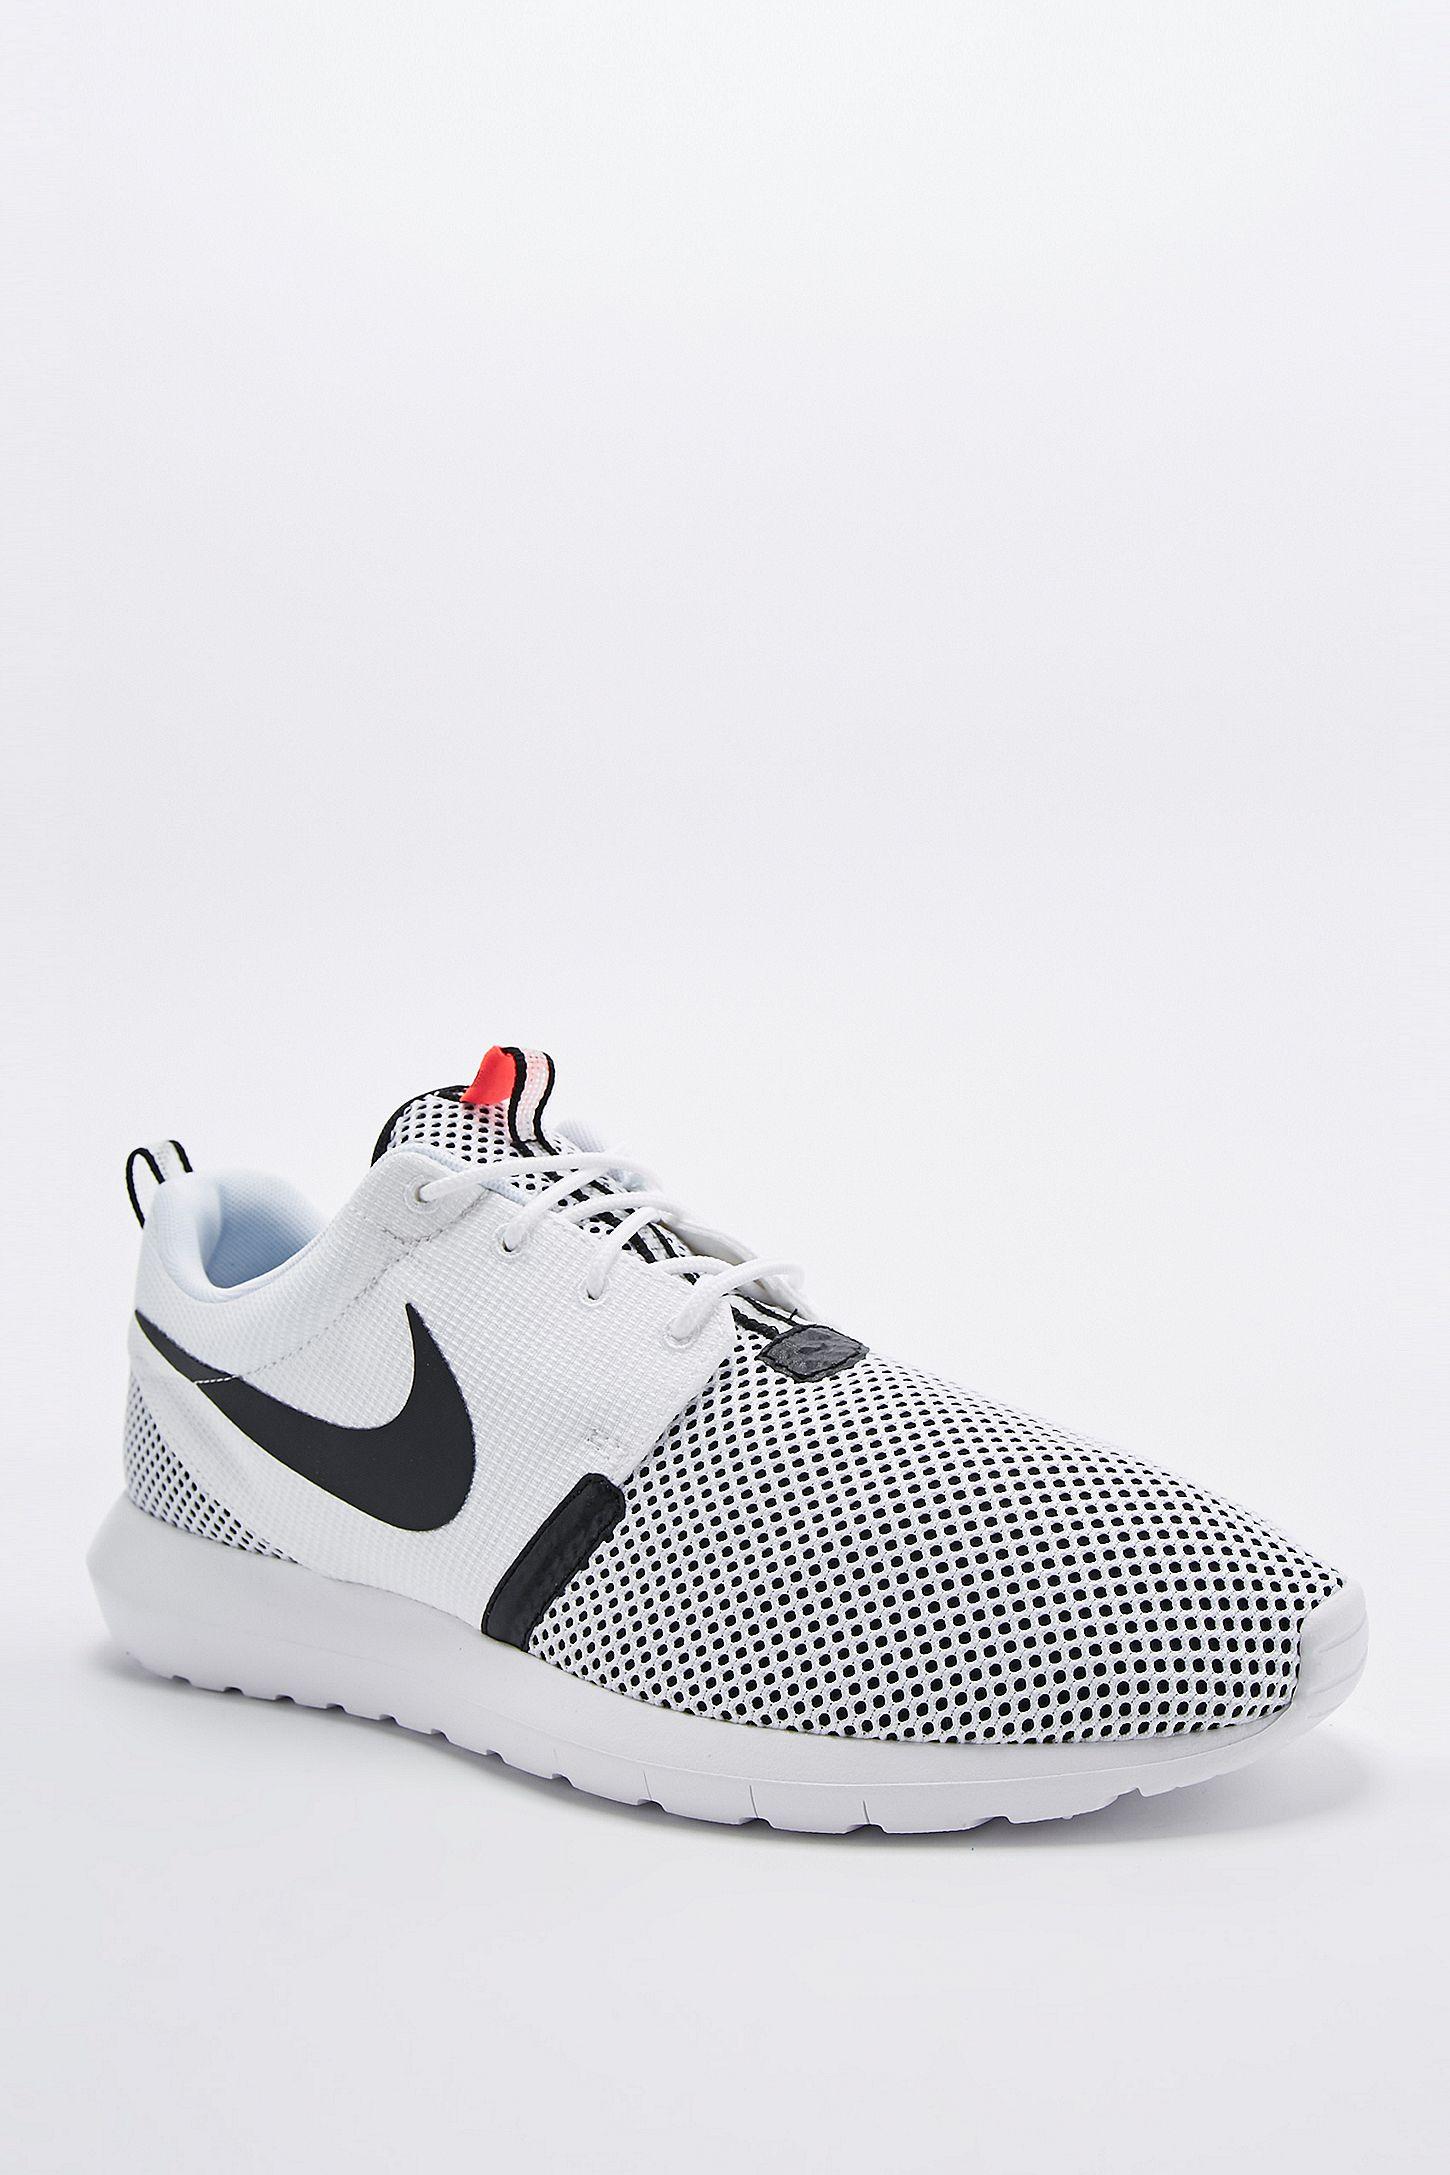 46ff1e4a171e Slide View  5  Nike Roshe Run NM BR Trainers in White and Black